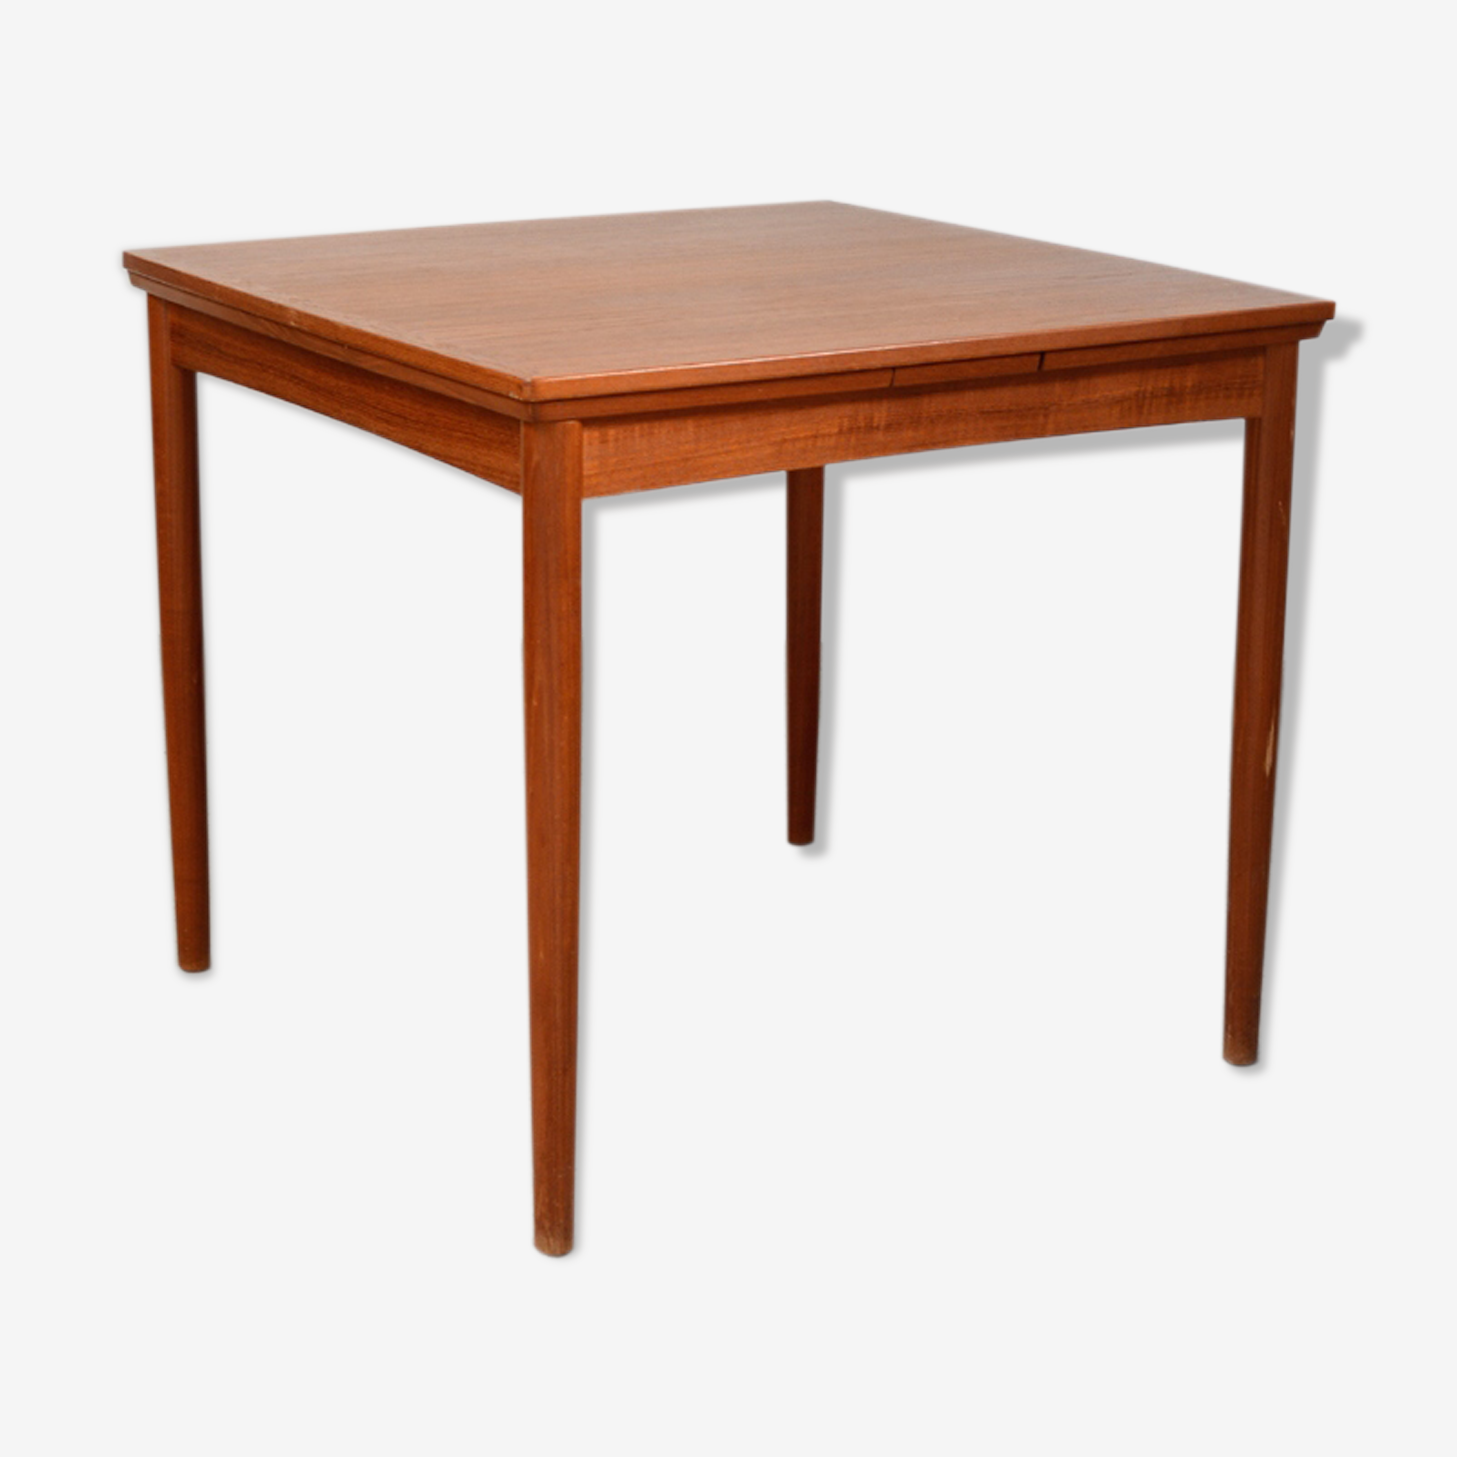 Table danoise en teck Hunvedad & Co